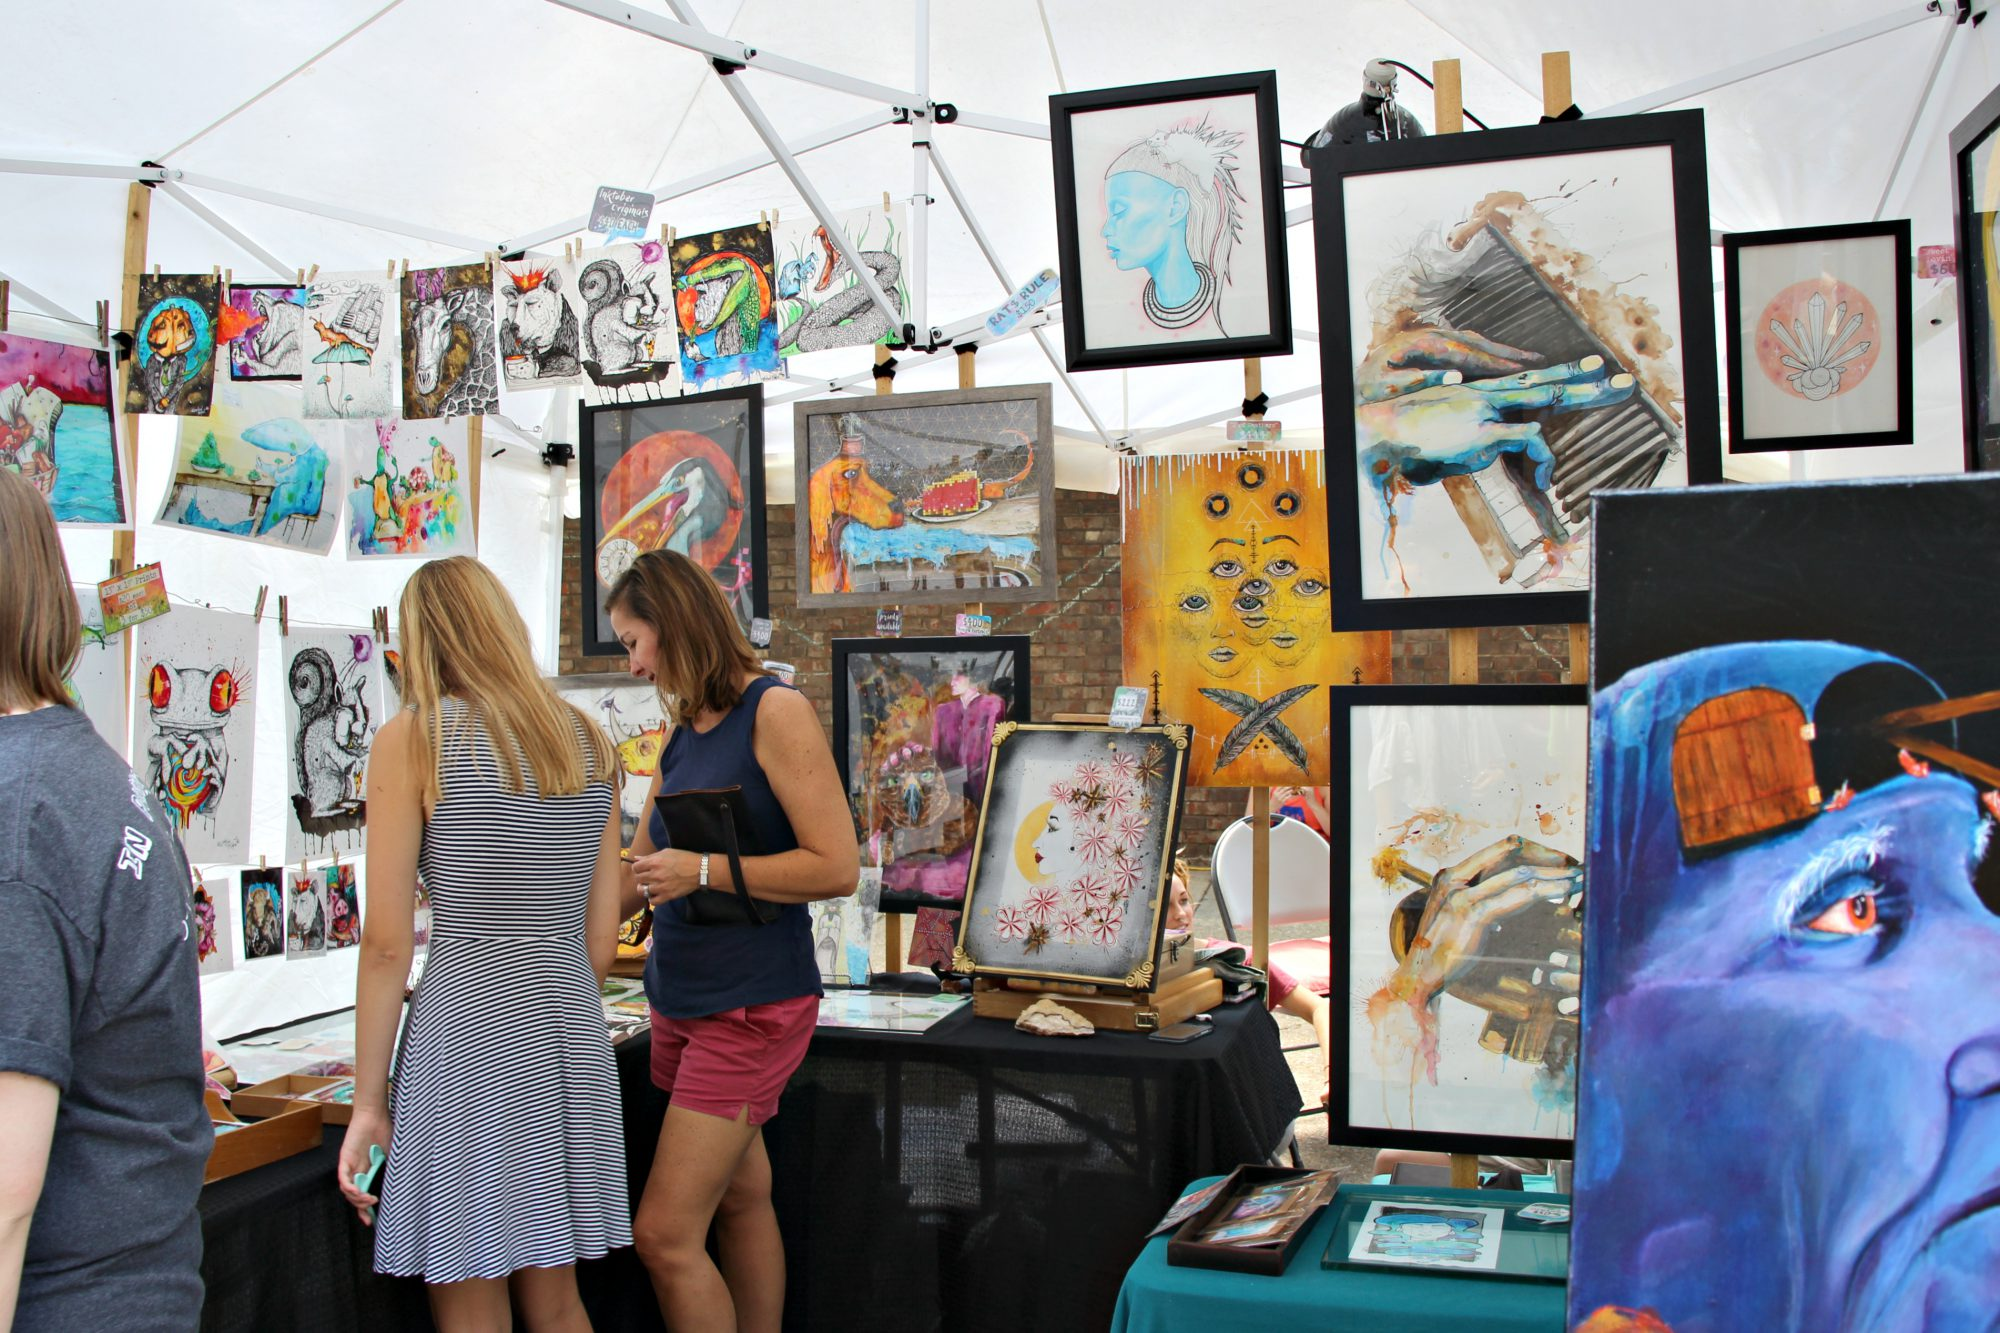 5 reasons you should attend Birmingham Artwalk, Sep. 10-11